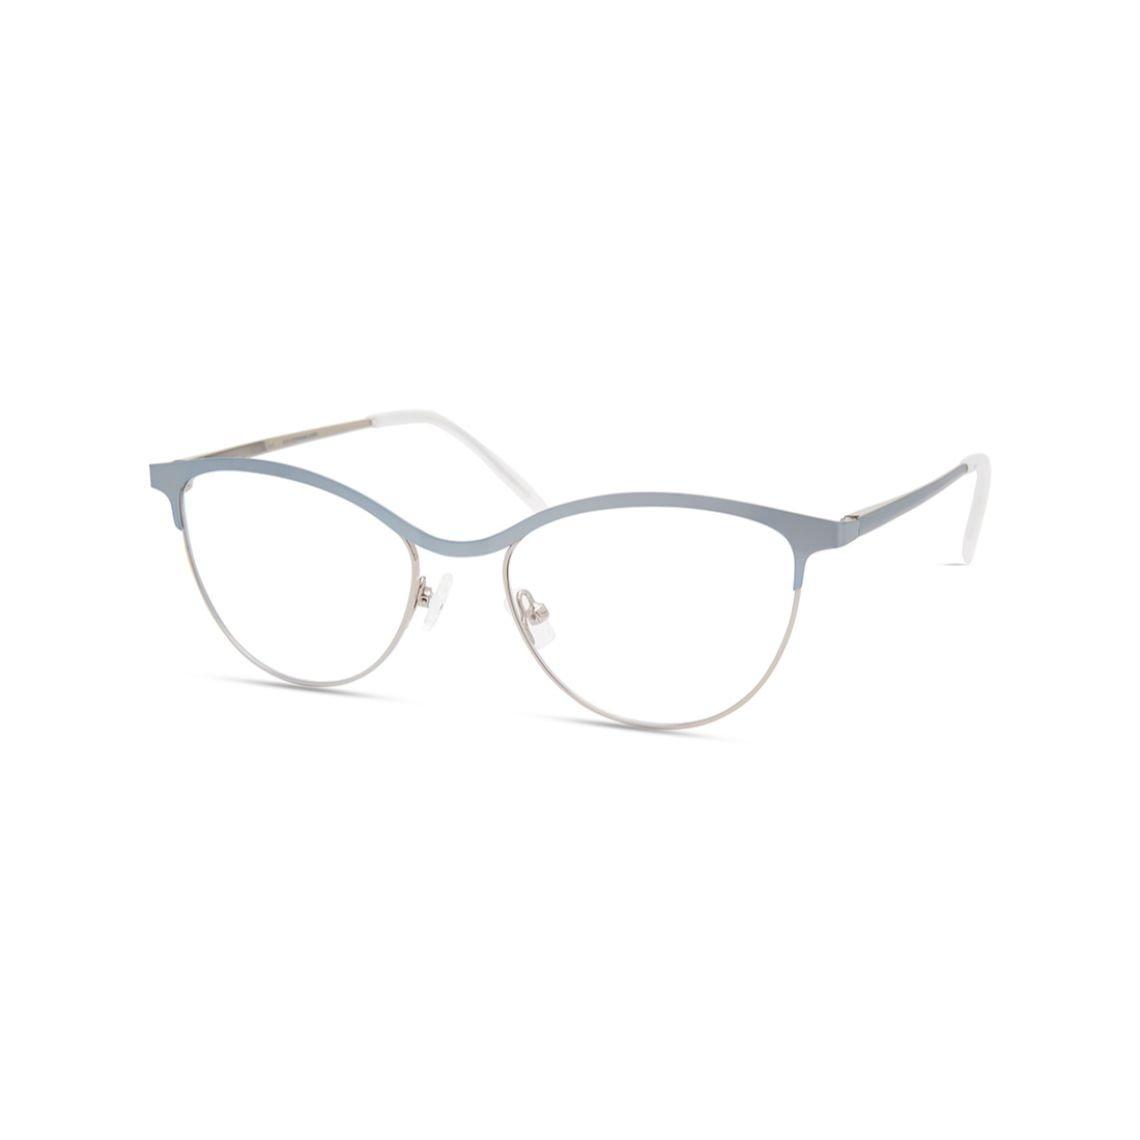 Eco Livigno Blue Grey/Silver 5317